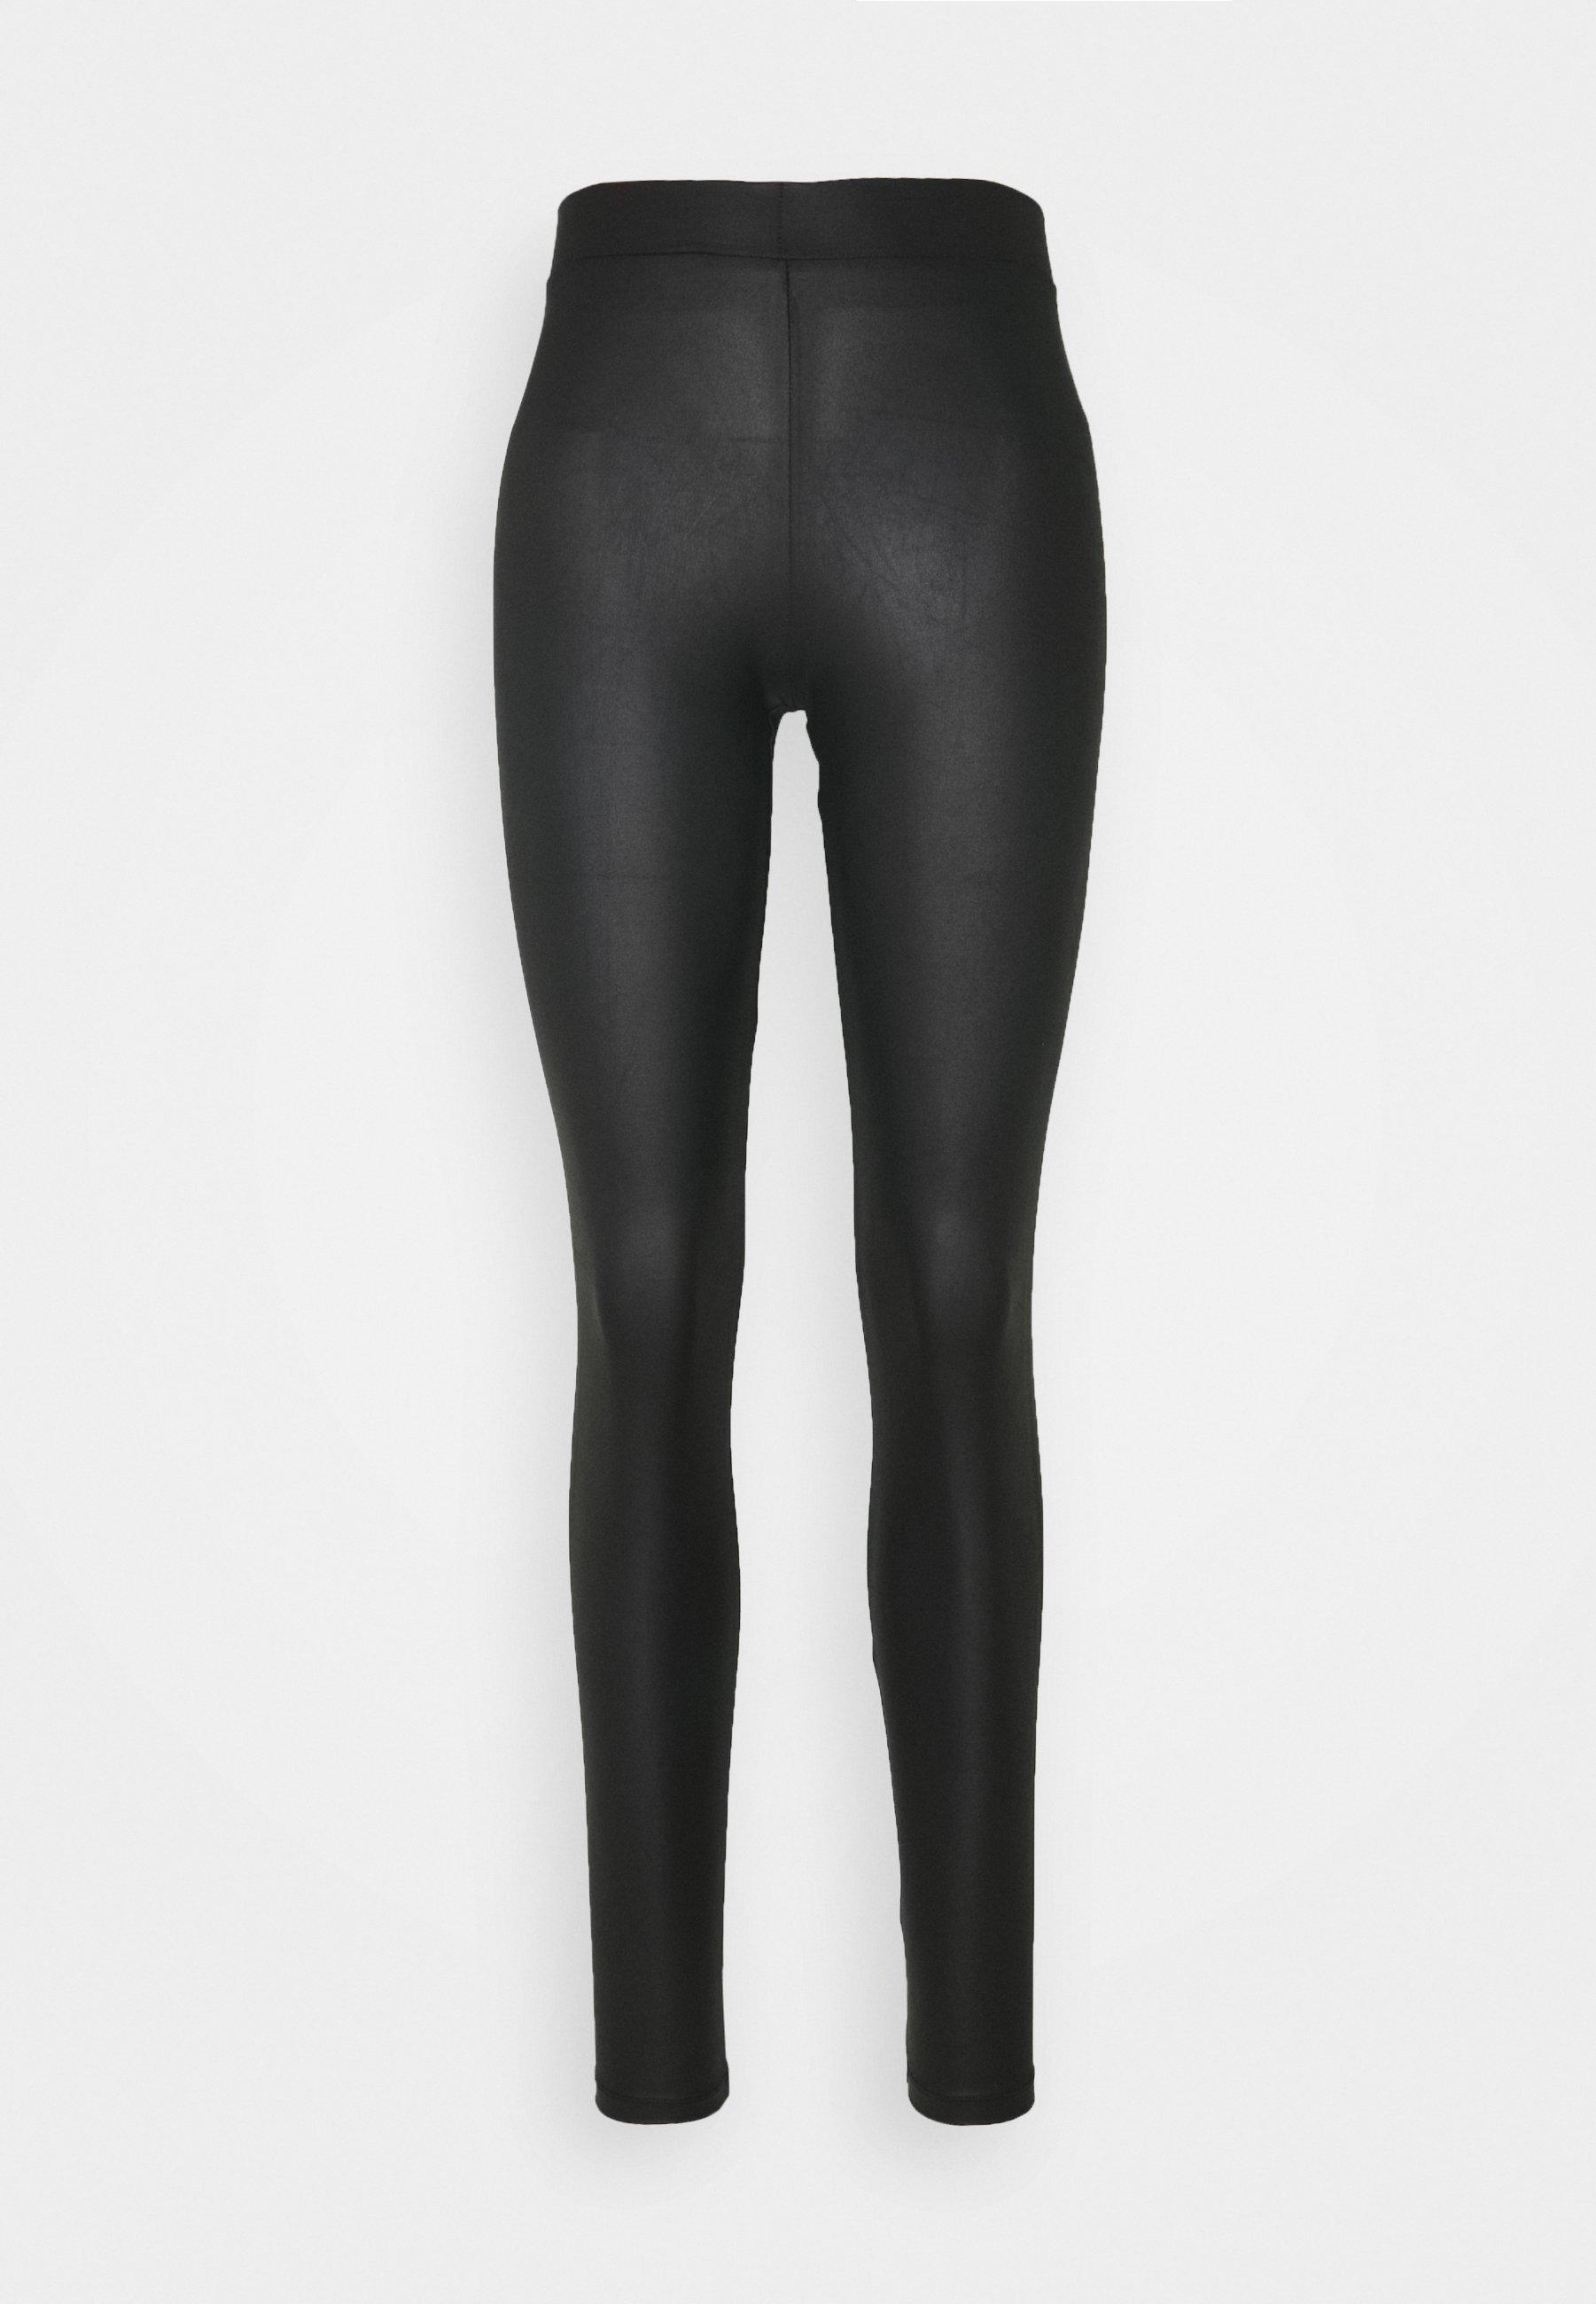 Women PCNEW SHINY TALL - Leggings - Trousers